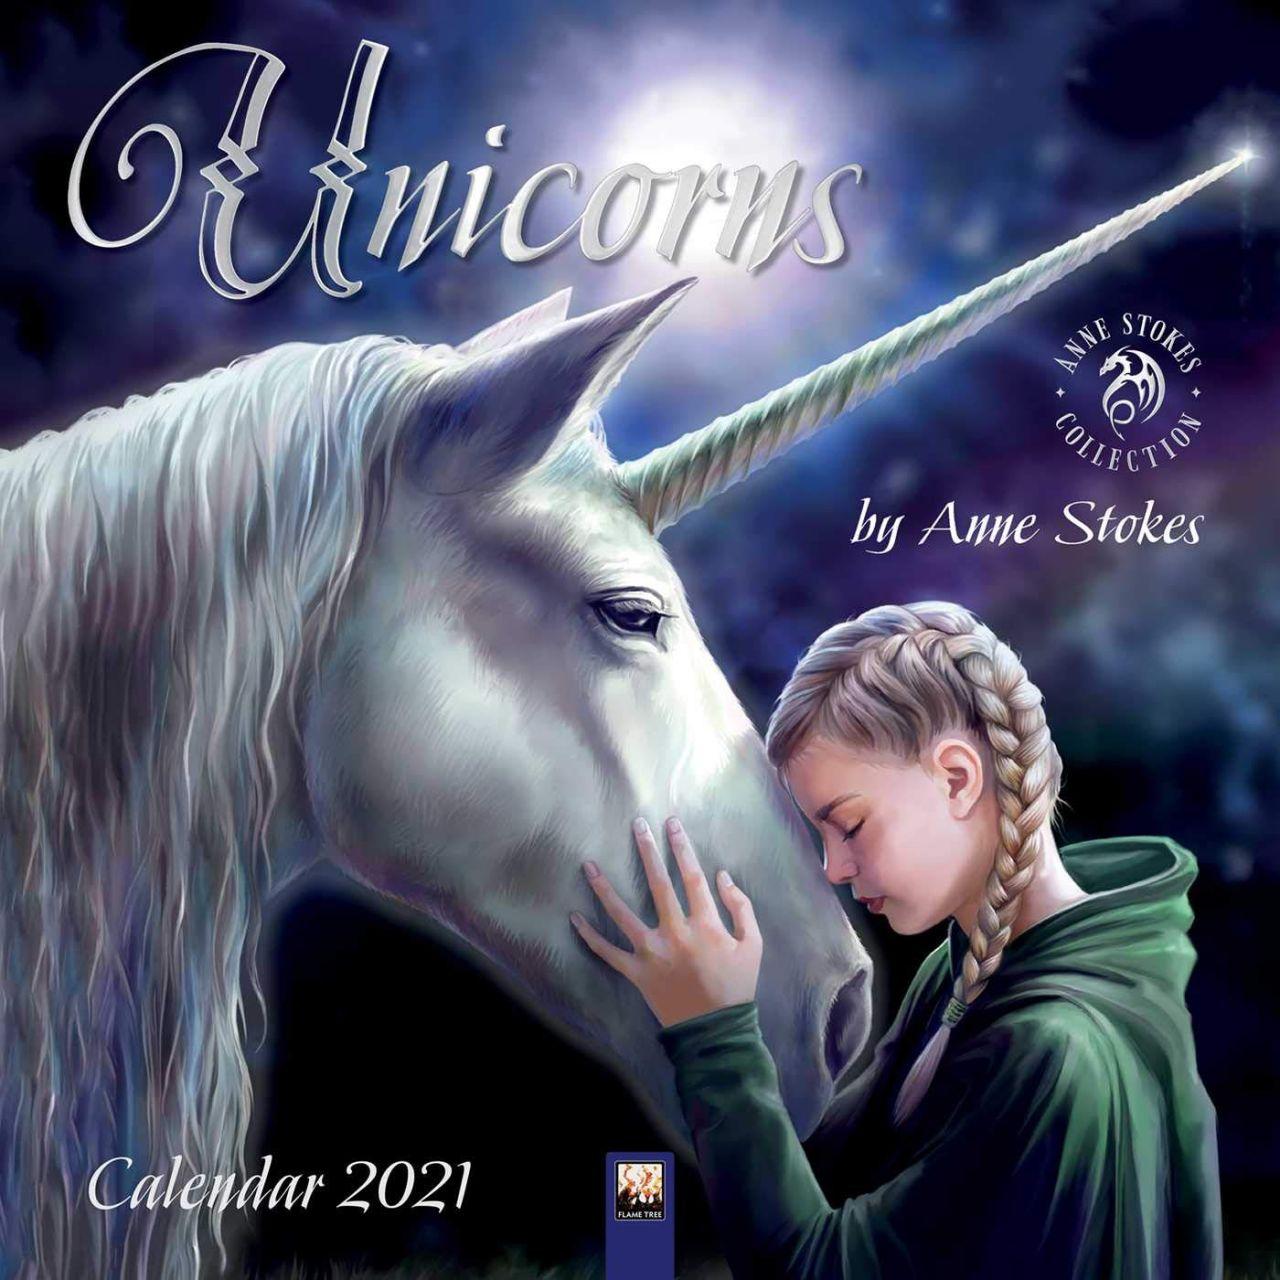 Anne Stokes Calendar 2021 - Unicorns